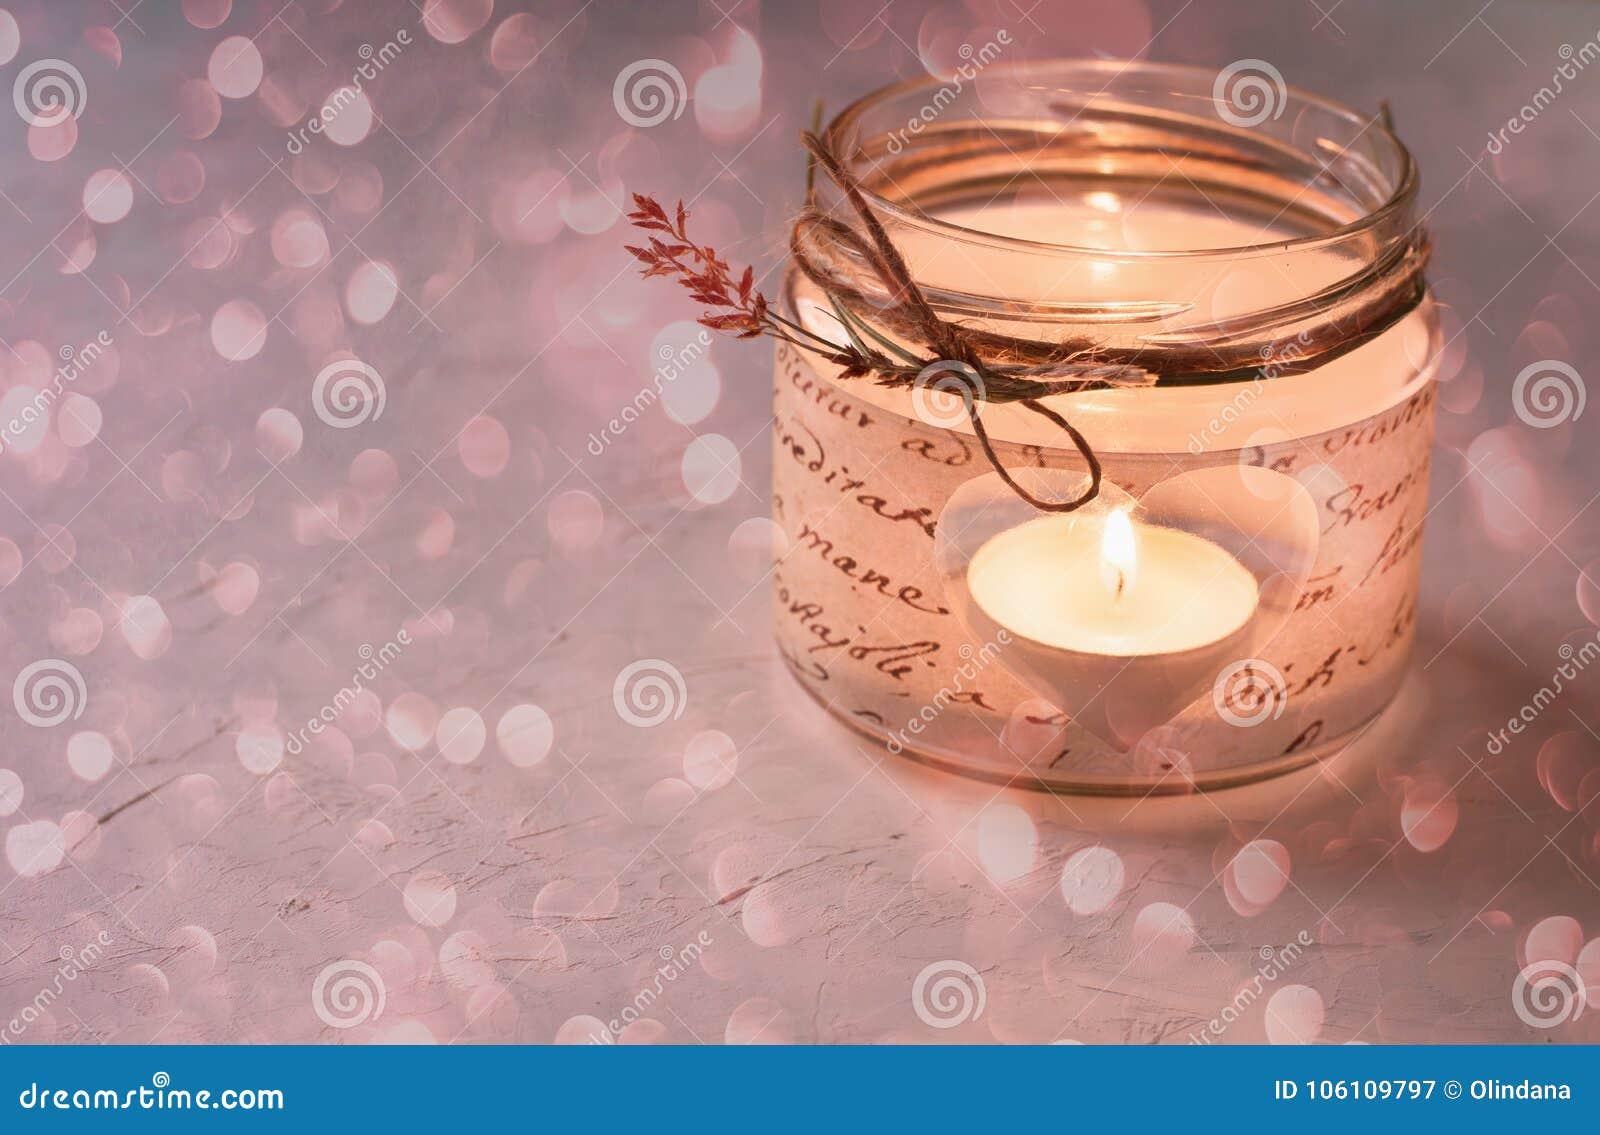 Glass Jar Candle Holder Decoupage Cut Out Heart Shape